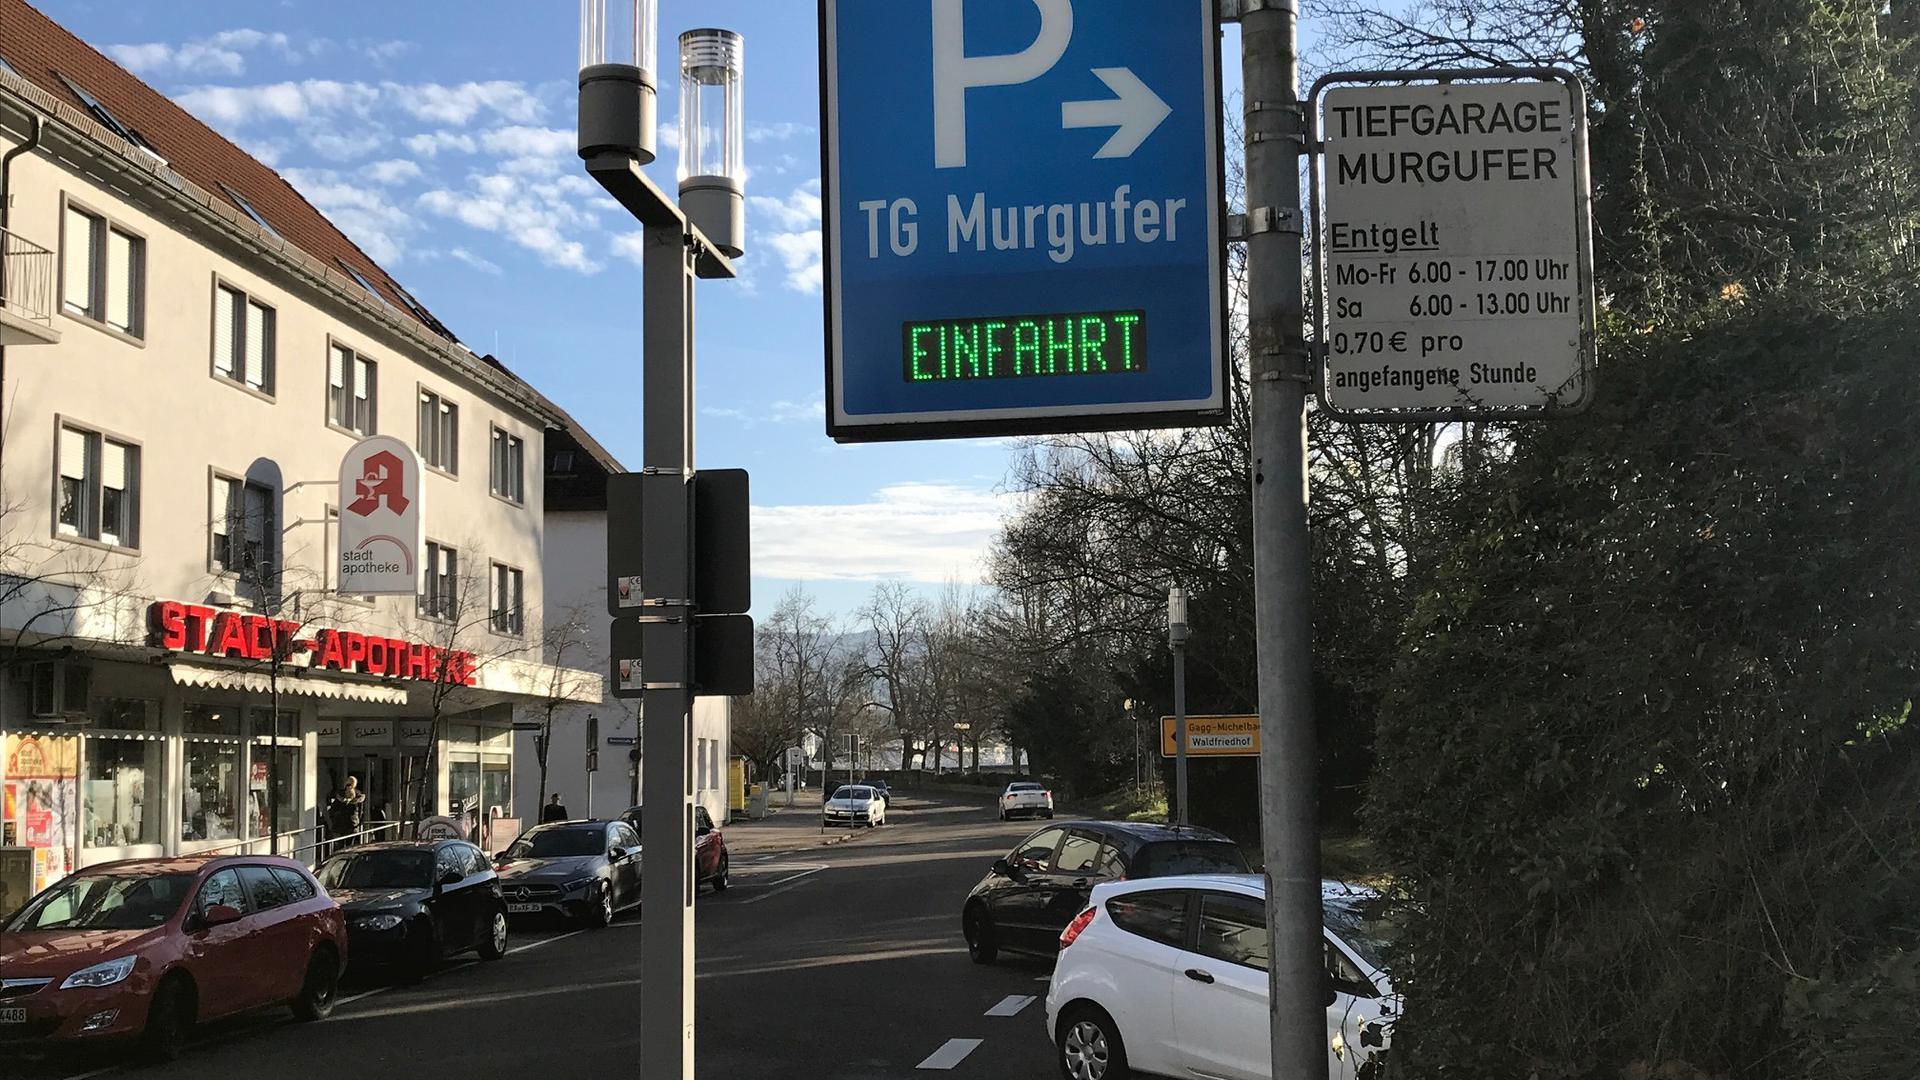 Tiefgarage Murgufer Gaggenau